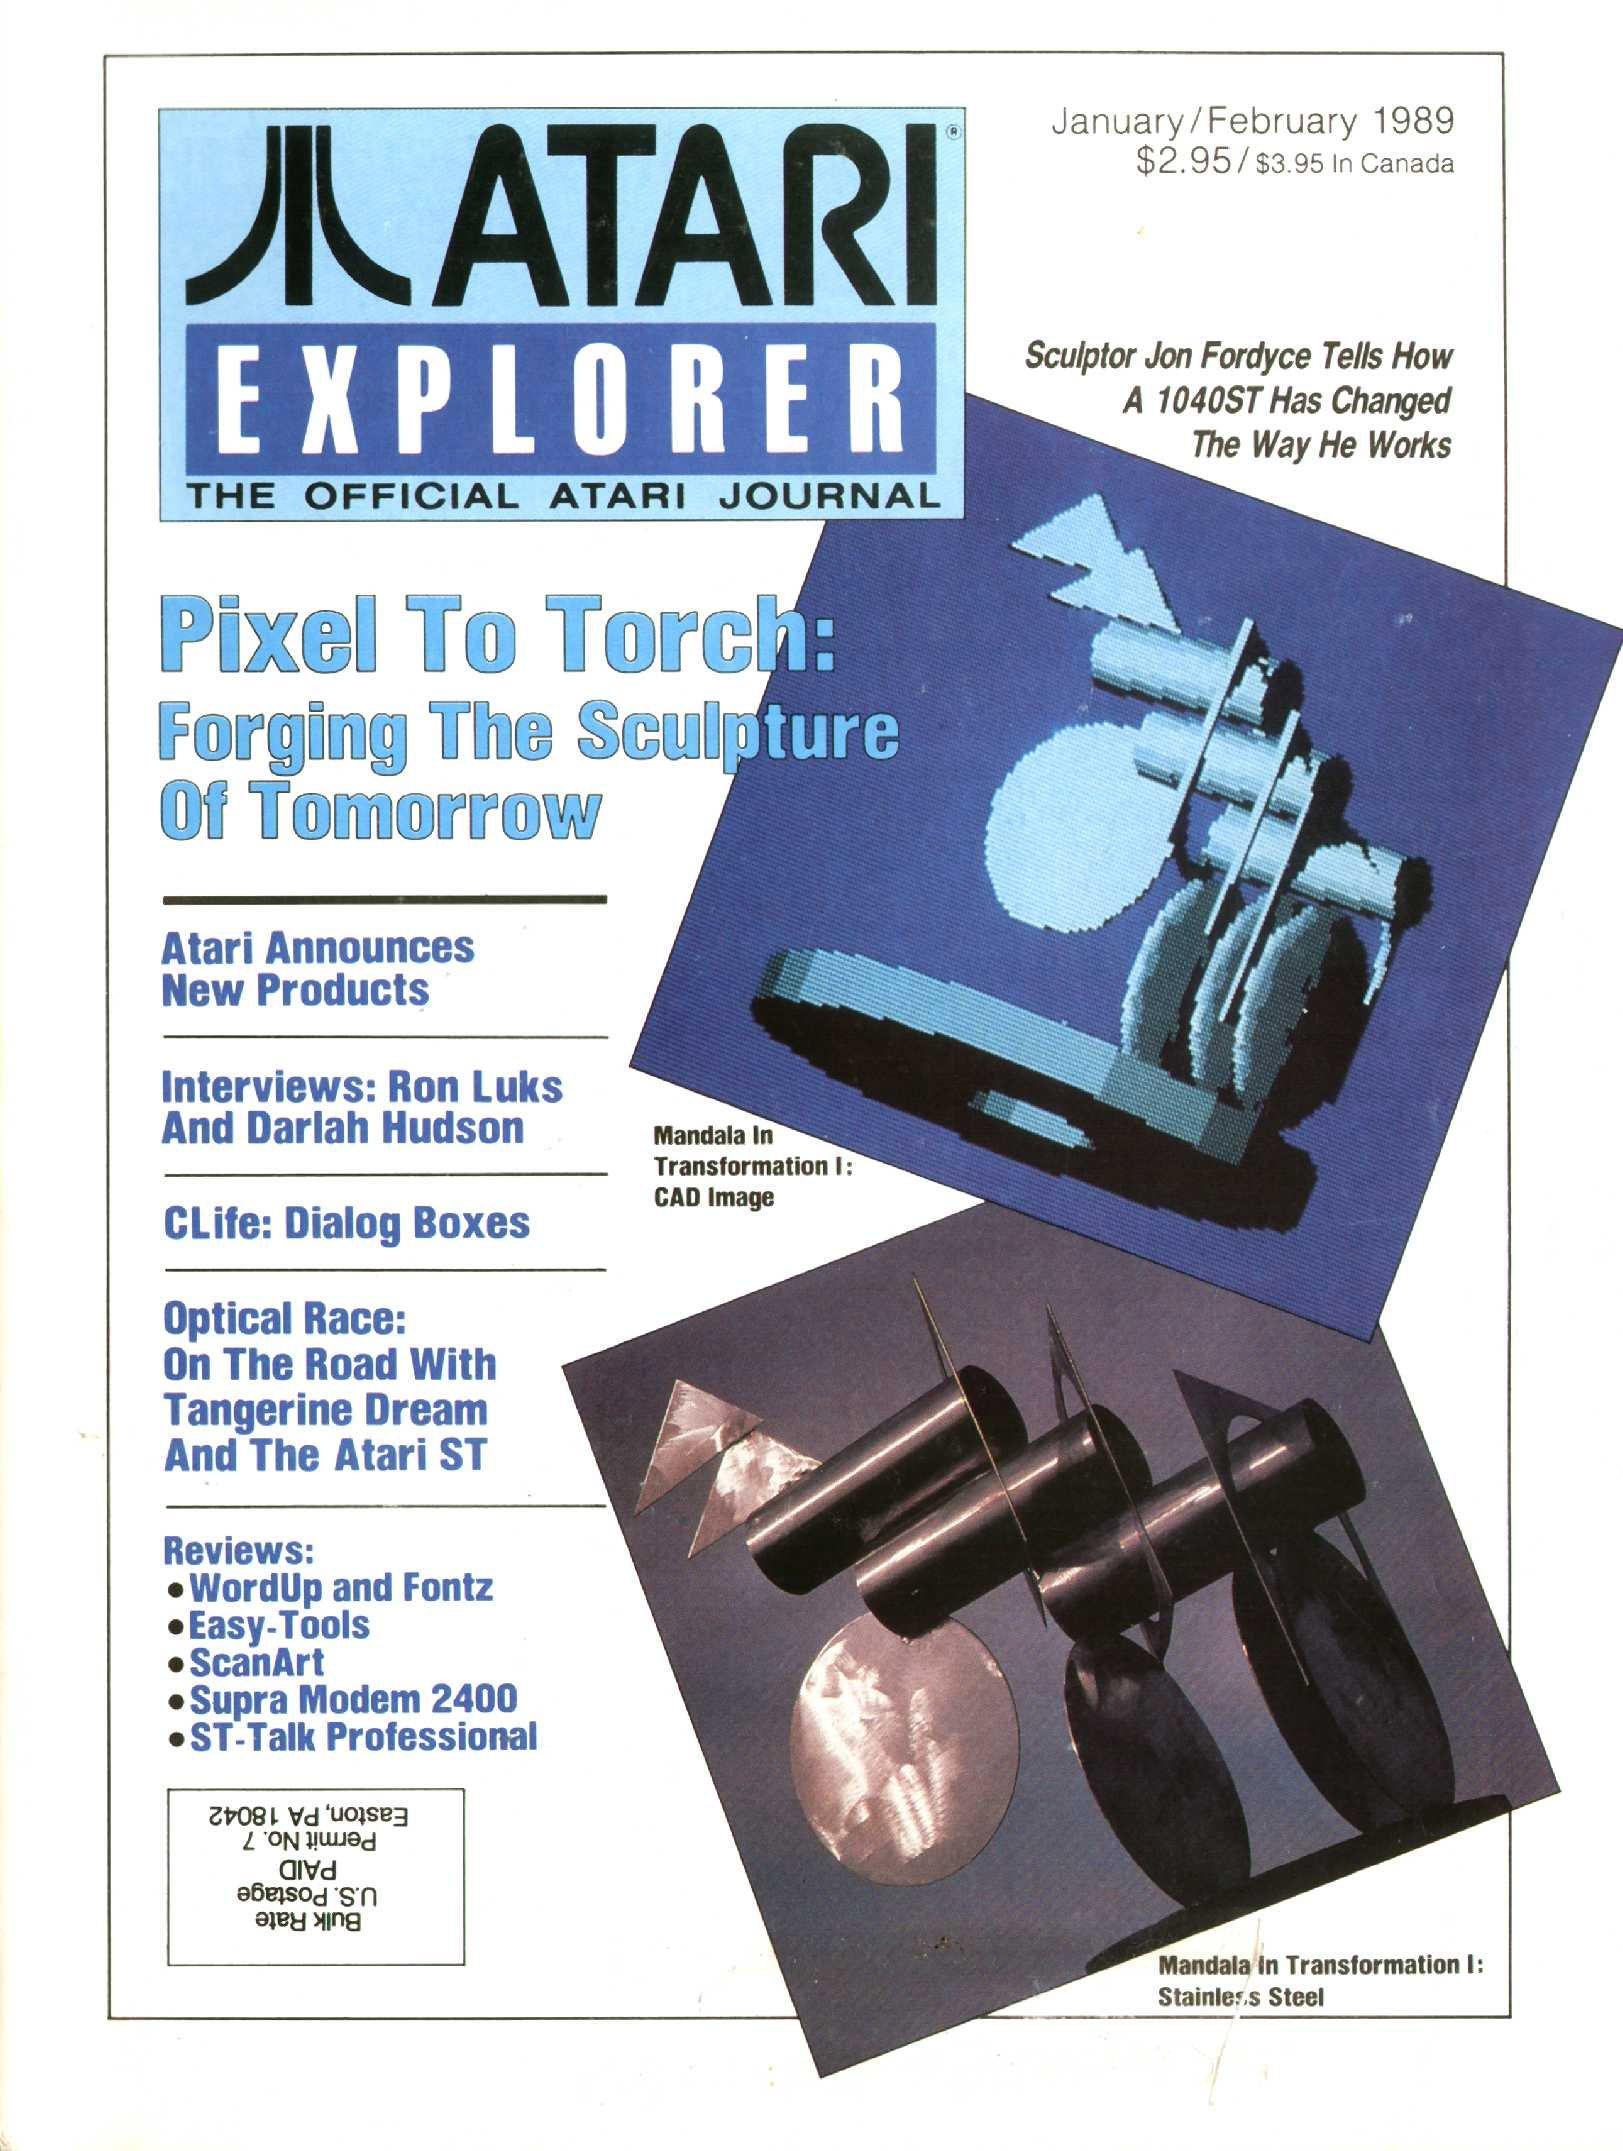 Atari Explorer Issue 18 (January / February 1989)